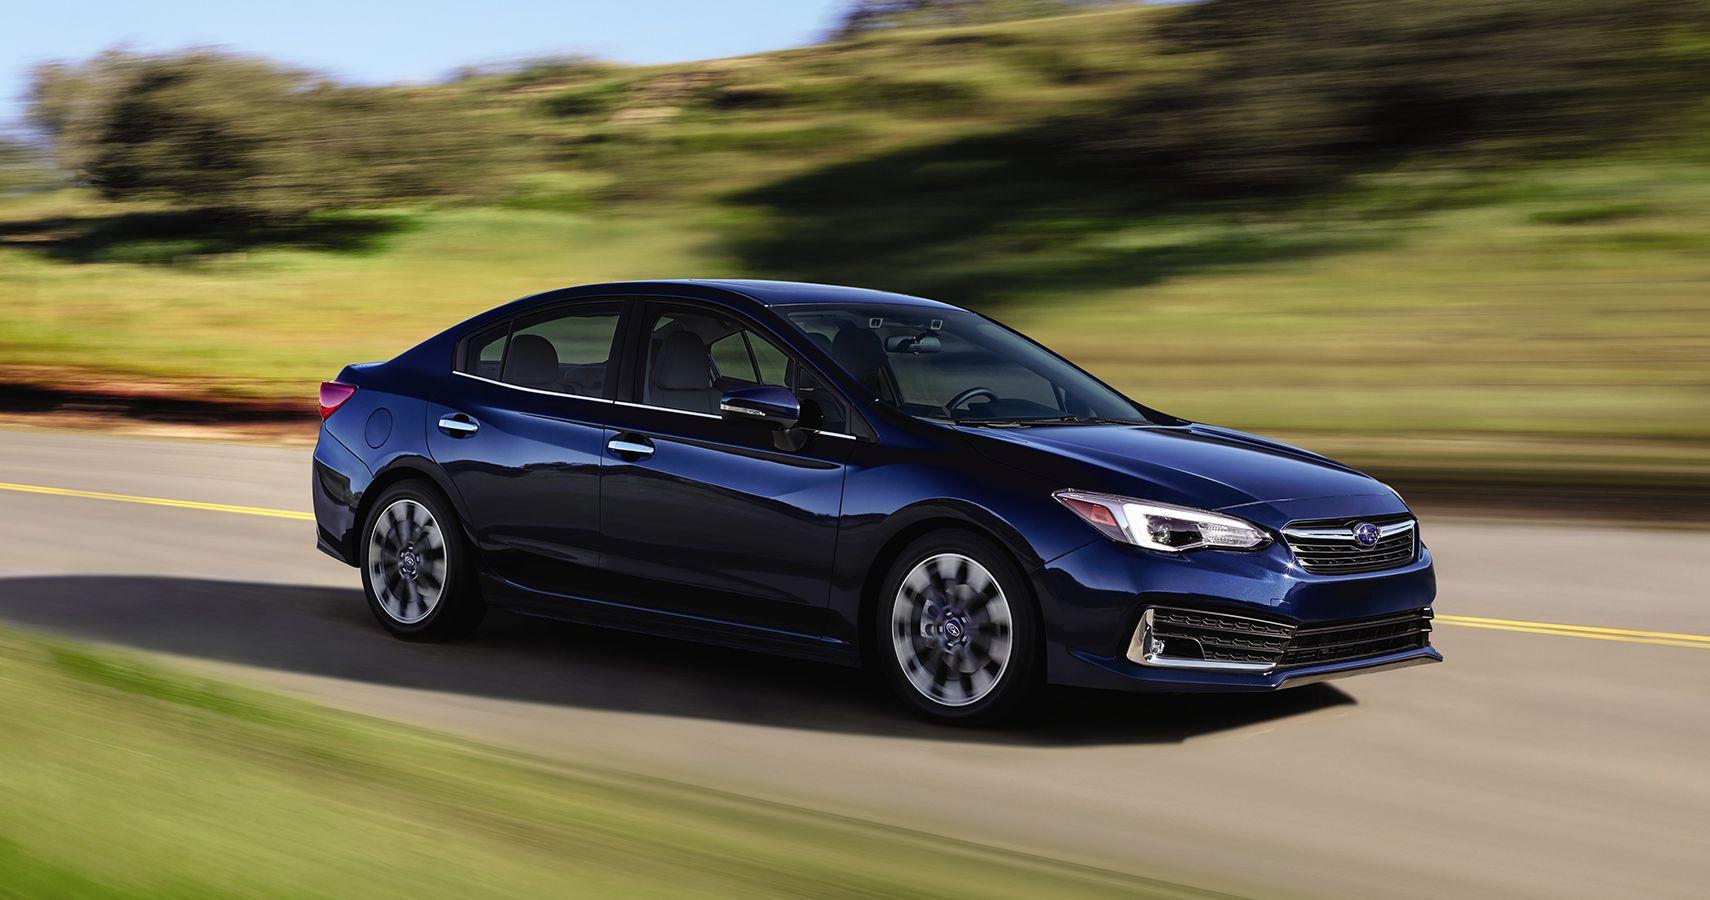 Subaru Impreza Returns In 2021 With New SI-Drive And Eyesight Technologies